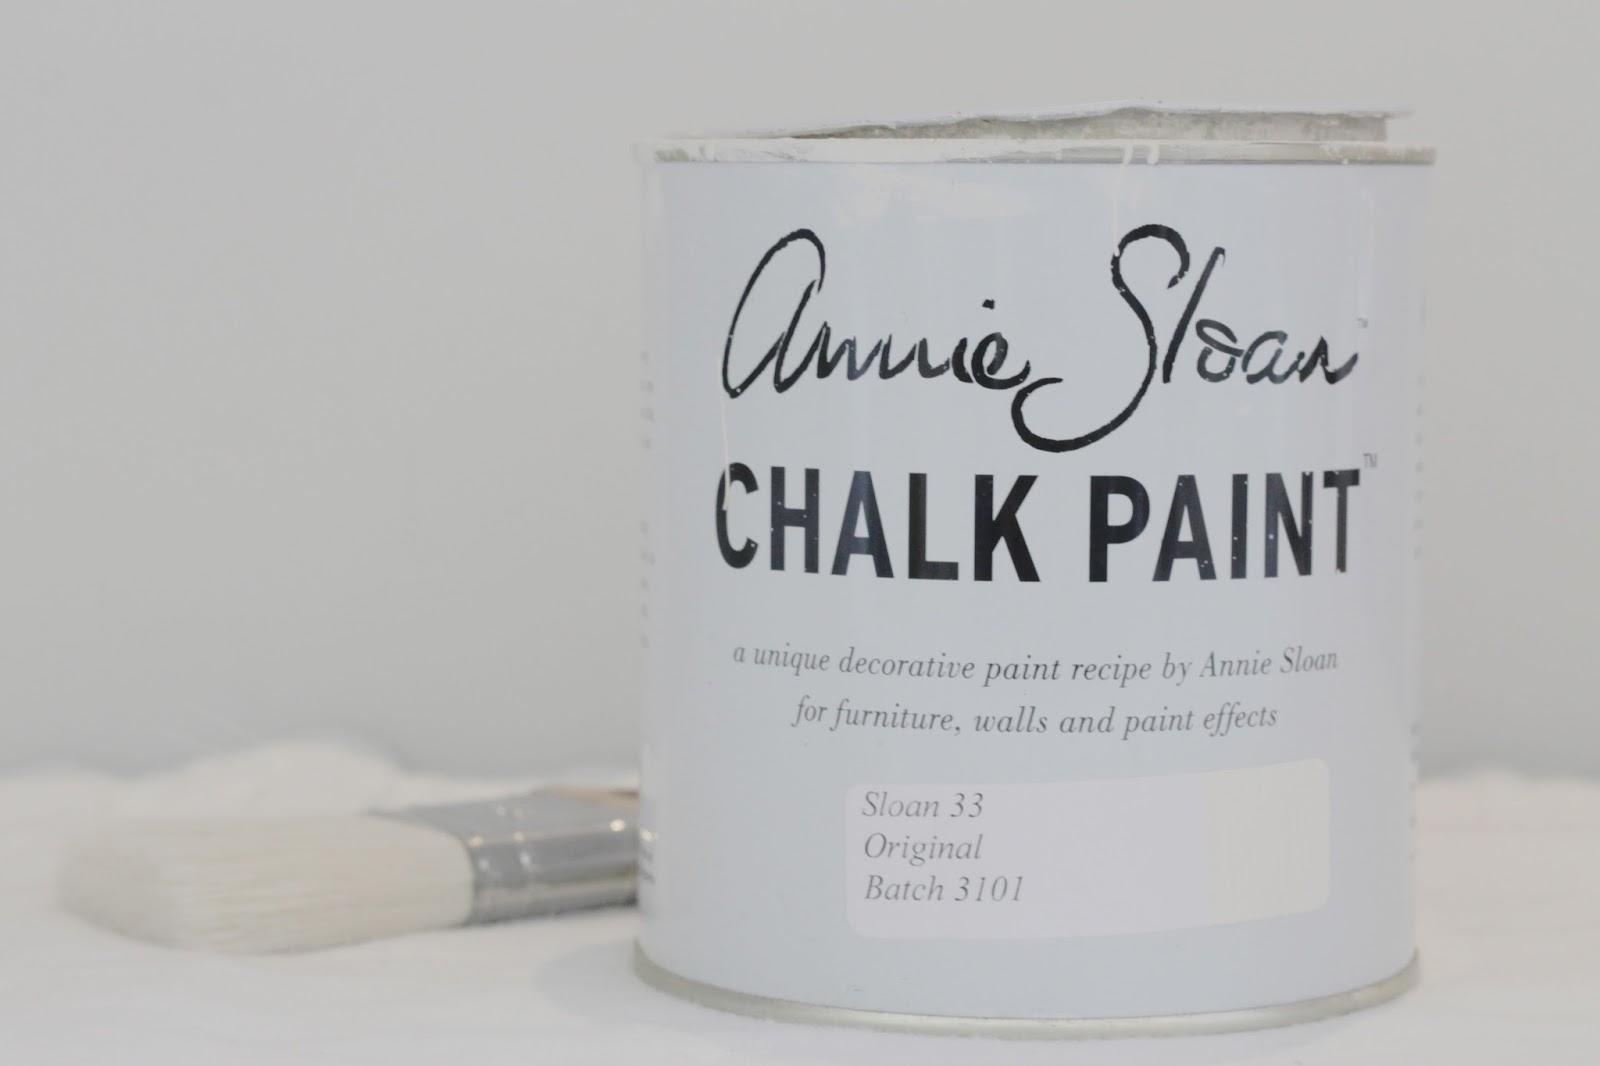 Vernice Chalk Paint Annie Sloan annie sloan italia: i prodotti annie sloan